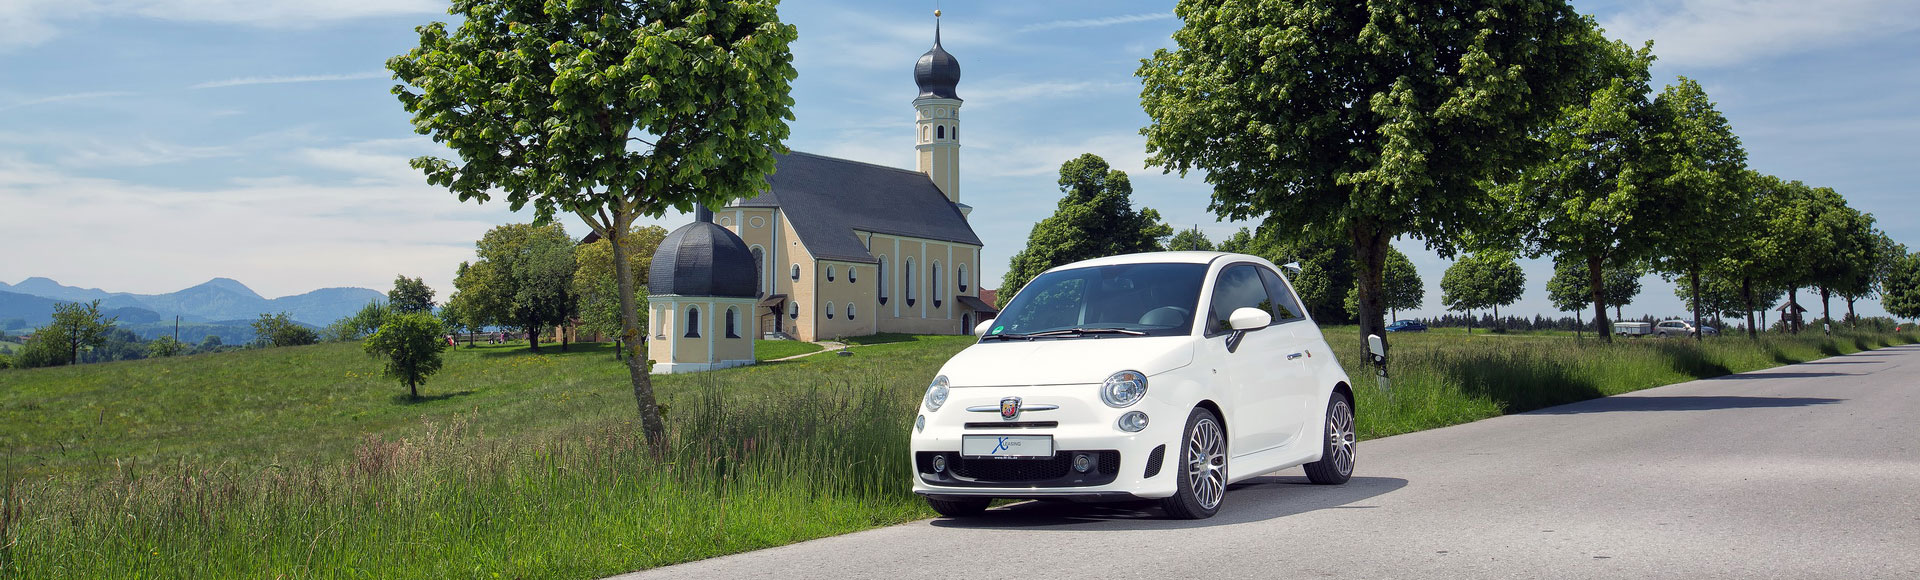 Fiat 500 16V Abarth Sommer 235